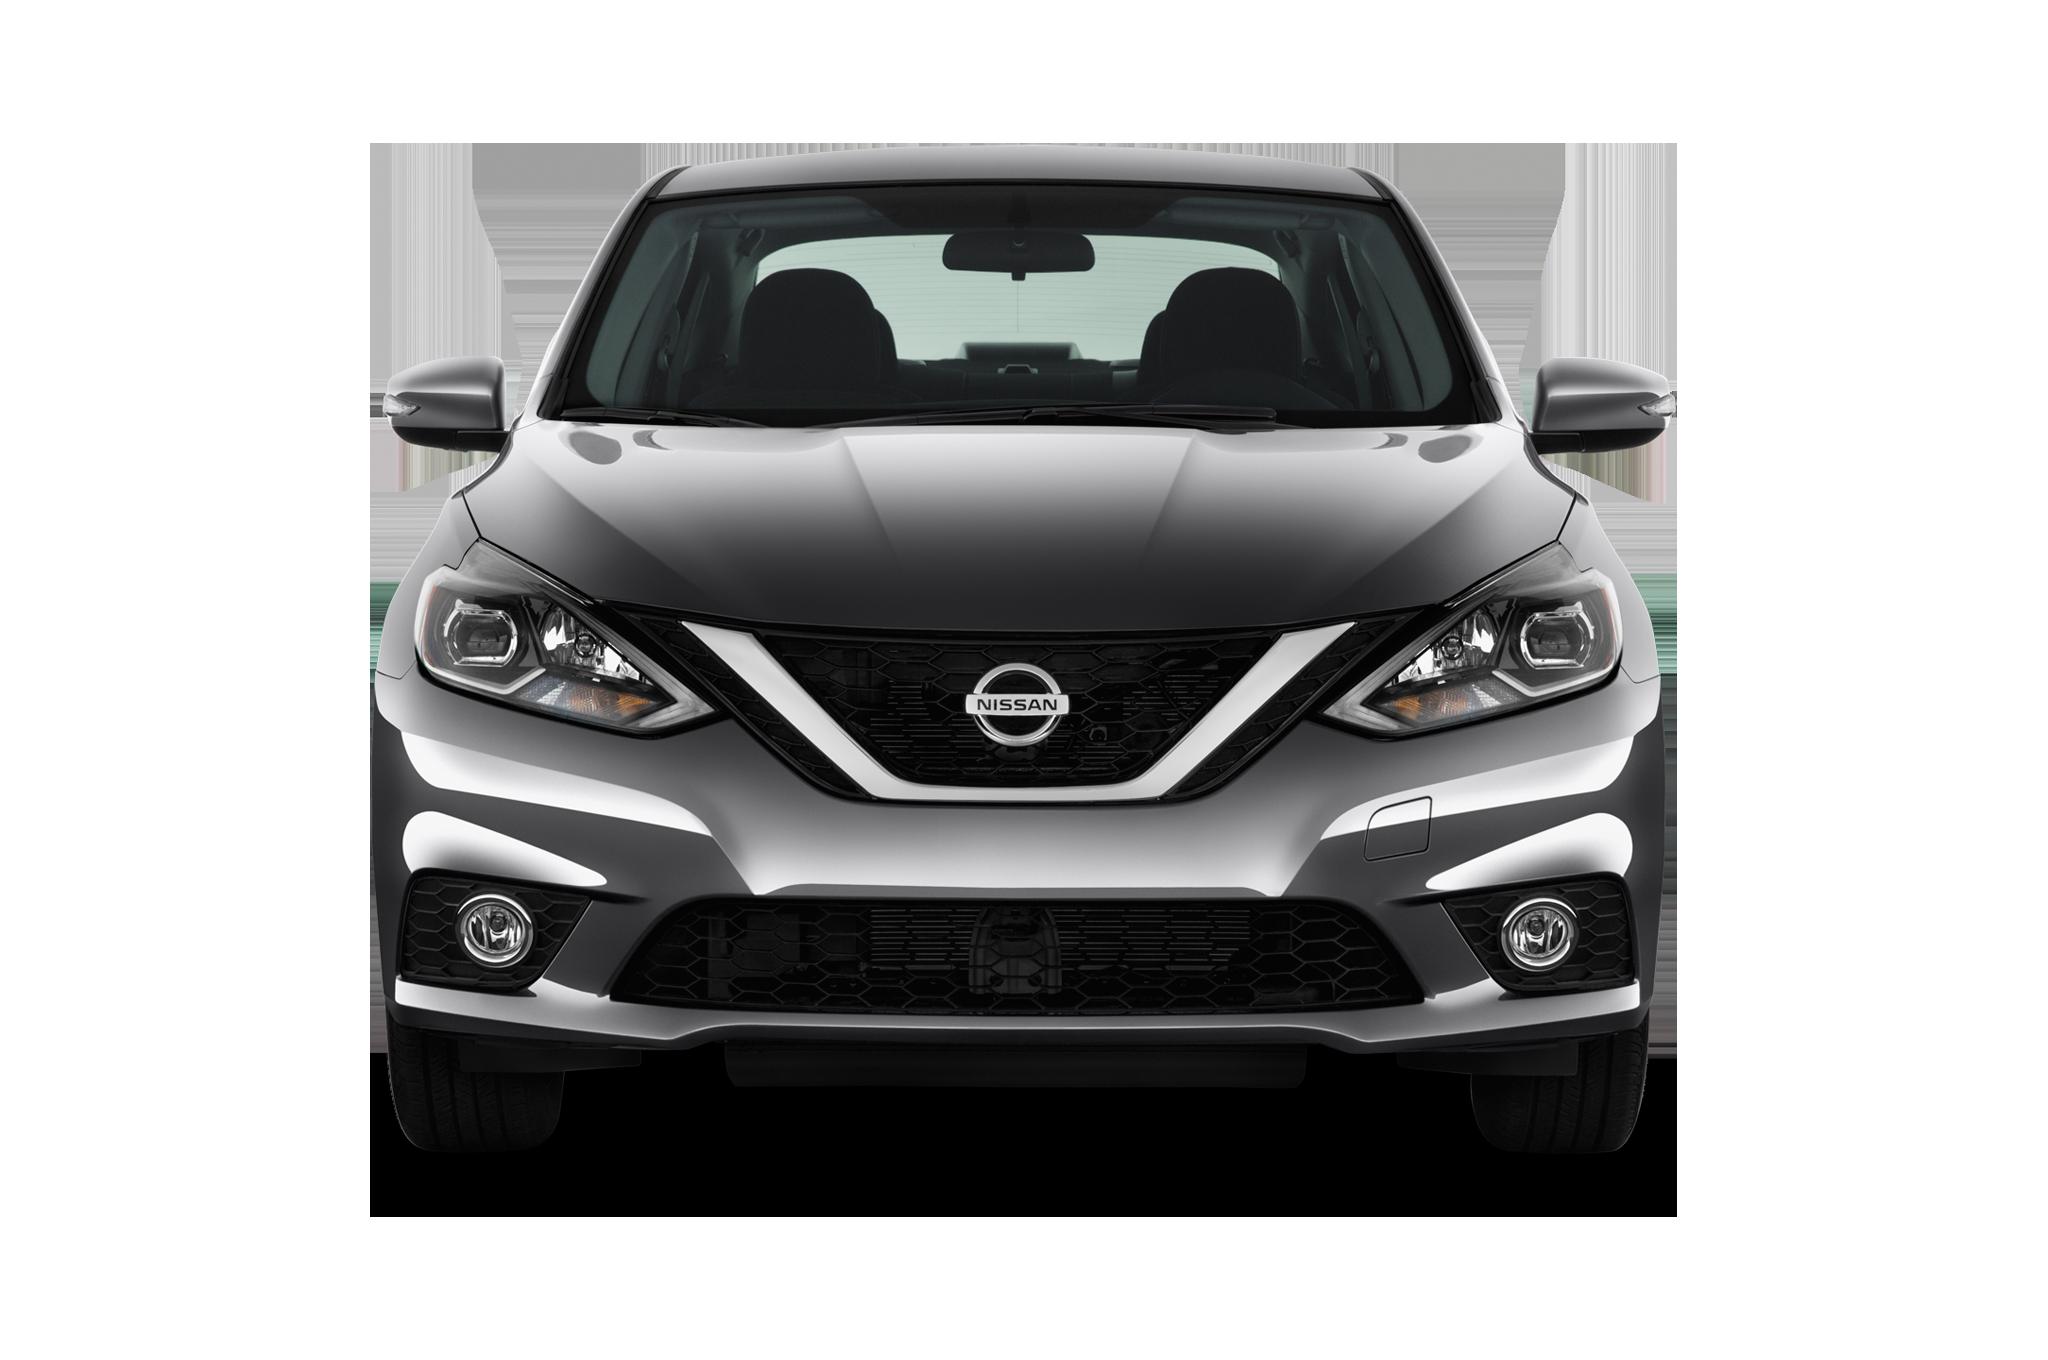 Mexico Says Adios to the Nissan Tsuru in 2017   Automobile ...